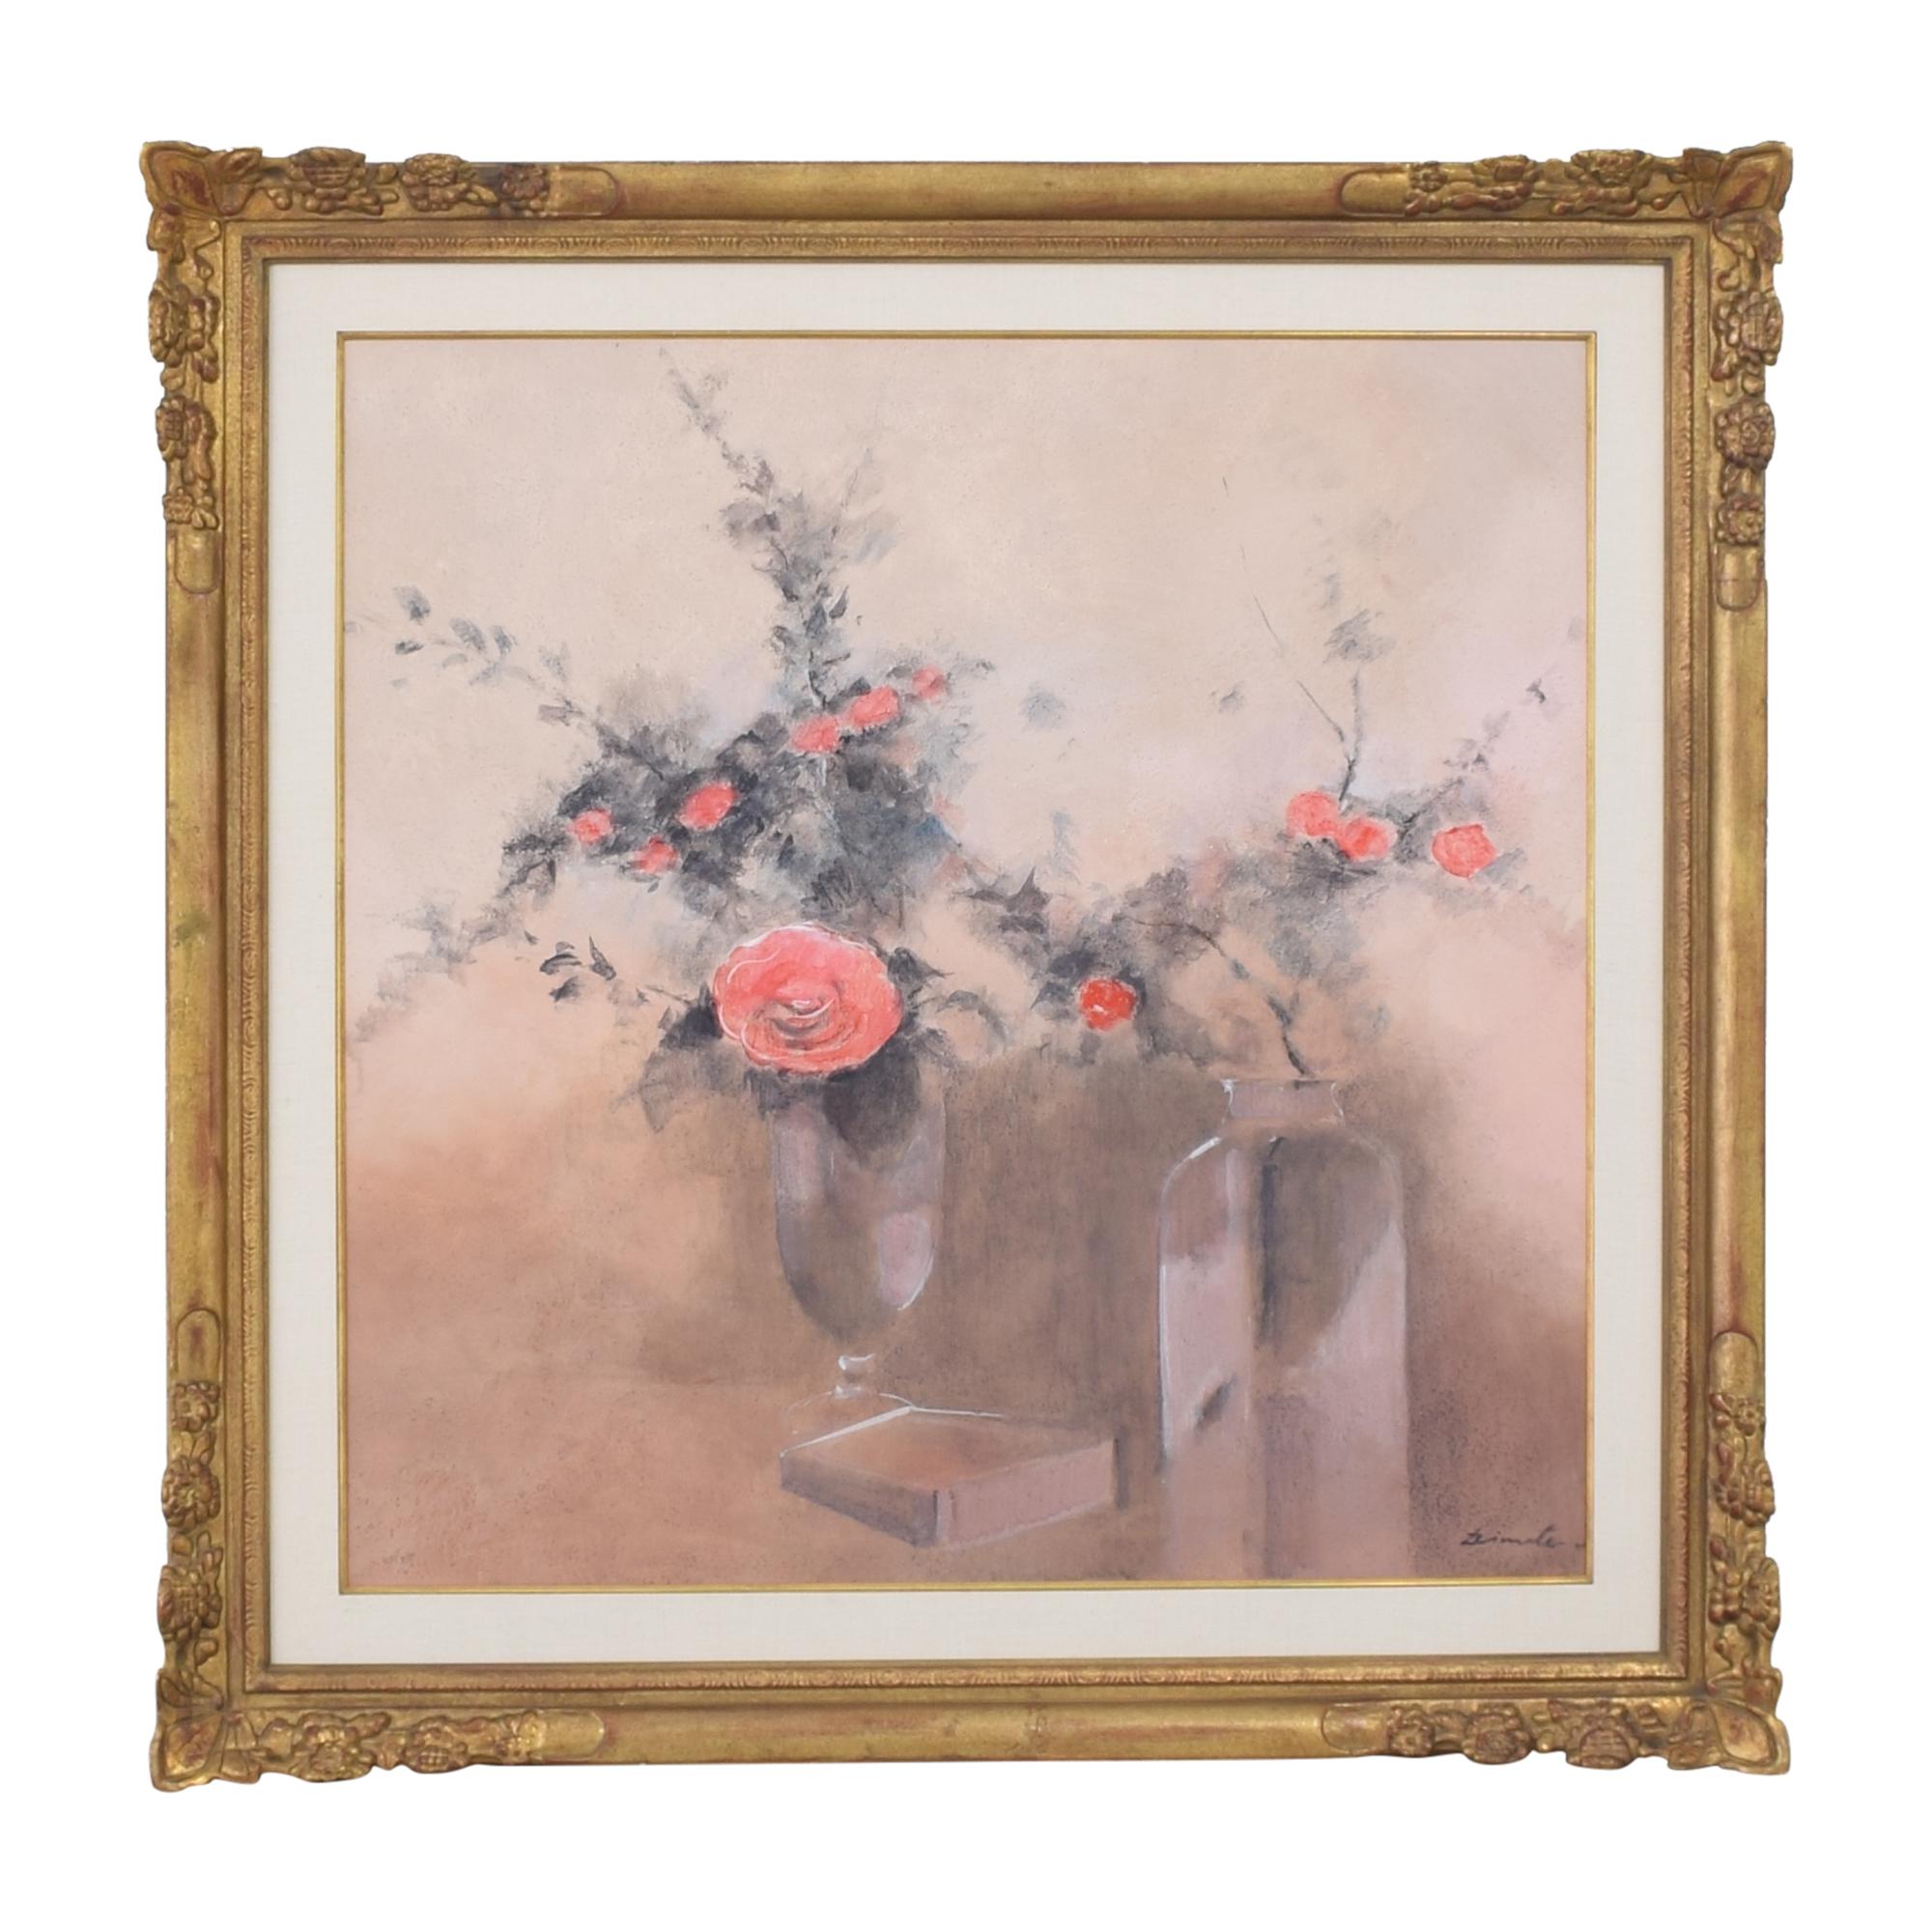 Dimitri Histoff Framed Wall Art pa